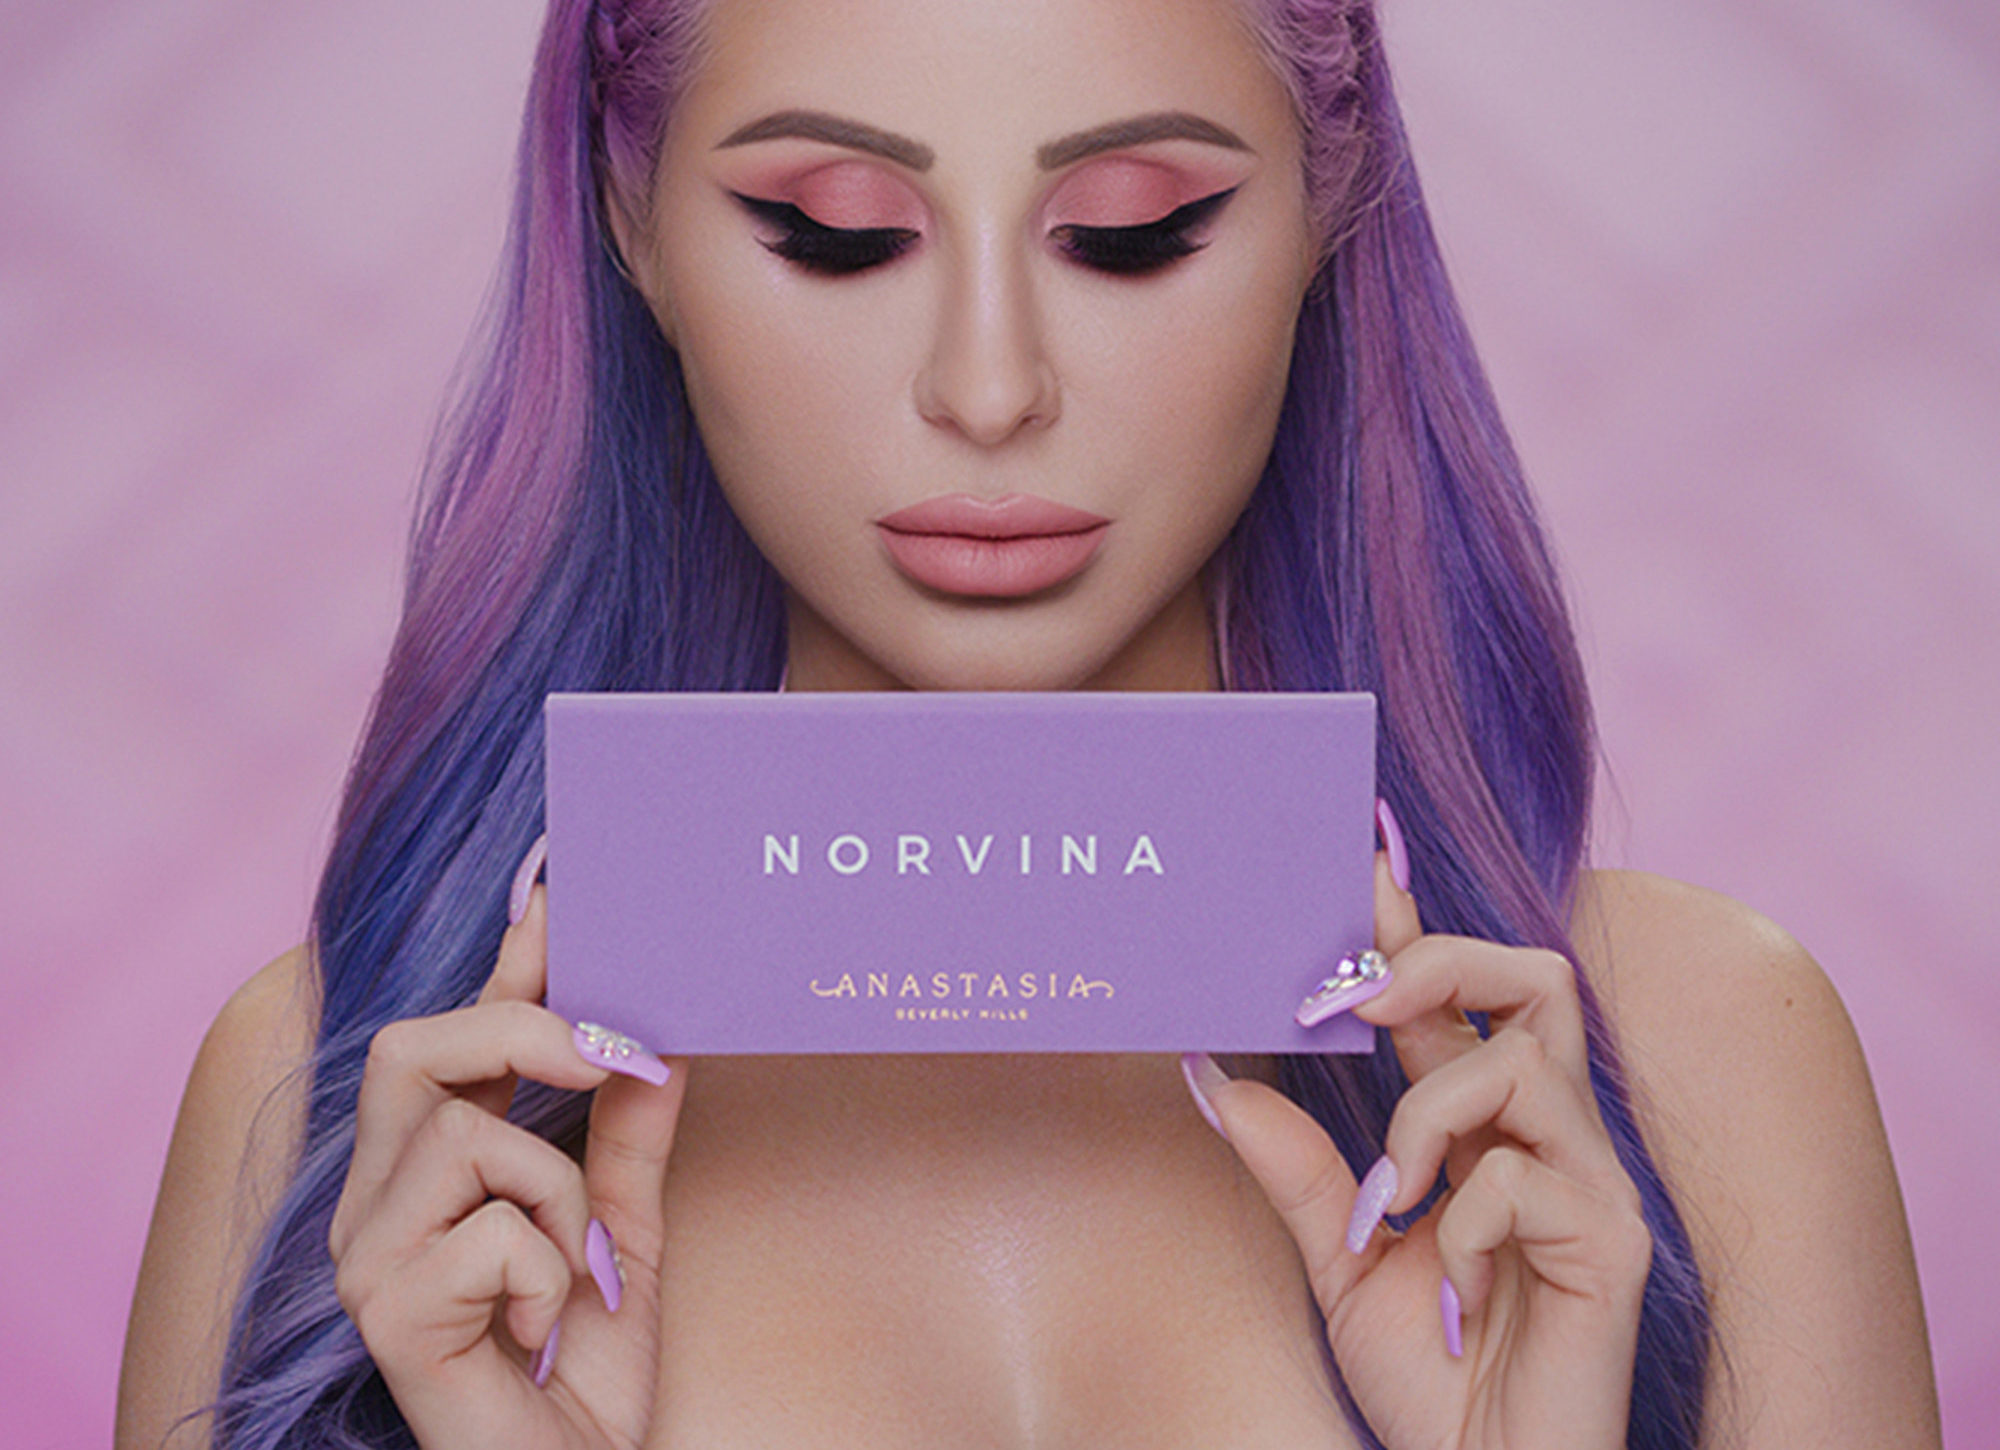 Anastasia Beverly Hills ABH Norvina Claudia Soare